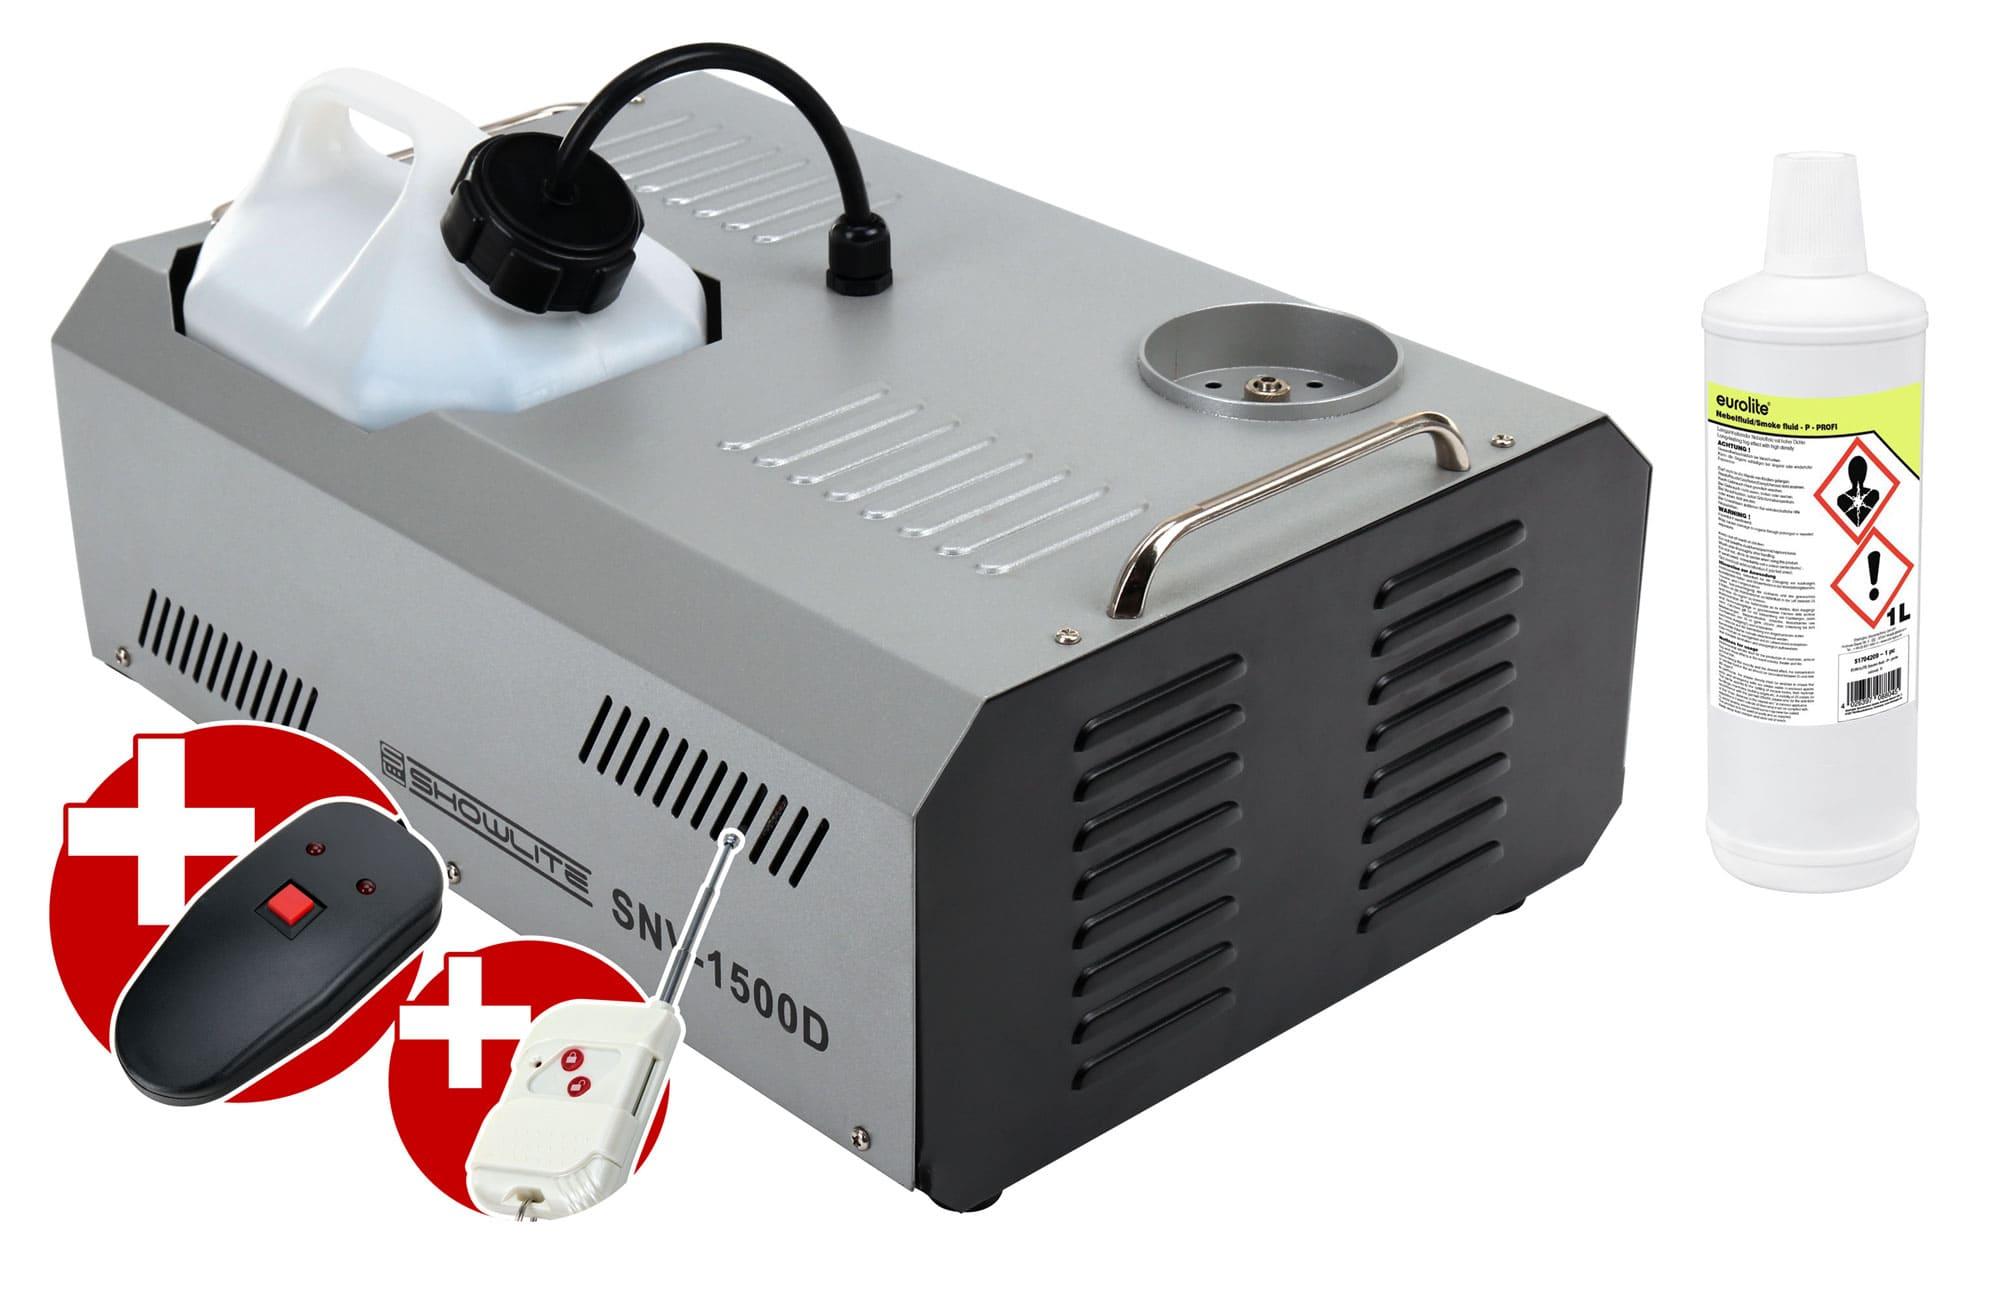 Nebeleffekte - Komplettset Showlite SNV 1500D DMX Vertikal Nebelmaschine 1500W inkl. Fernbedienung 1 L Nebelfluid - Onlineshop Musikhaus Kirstein